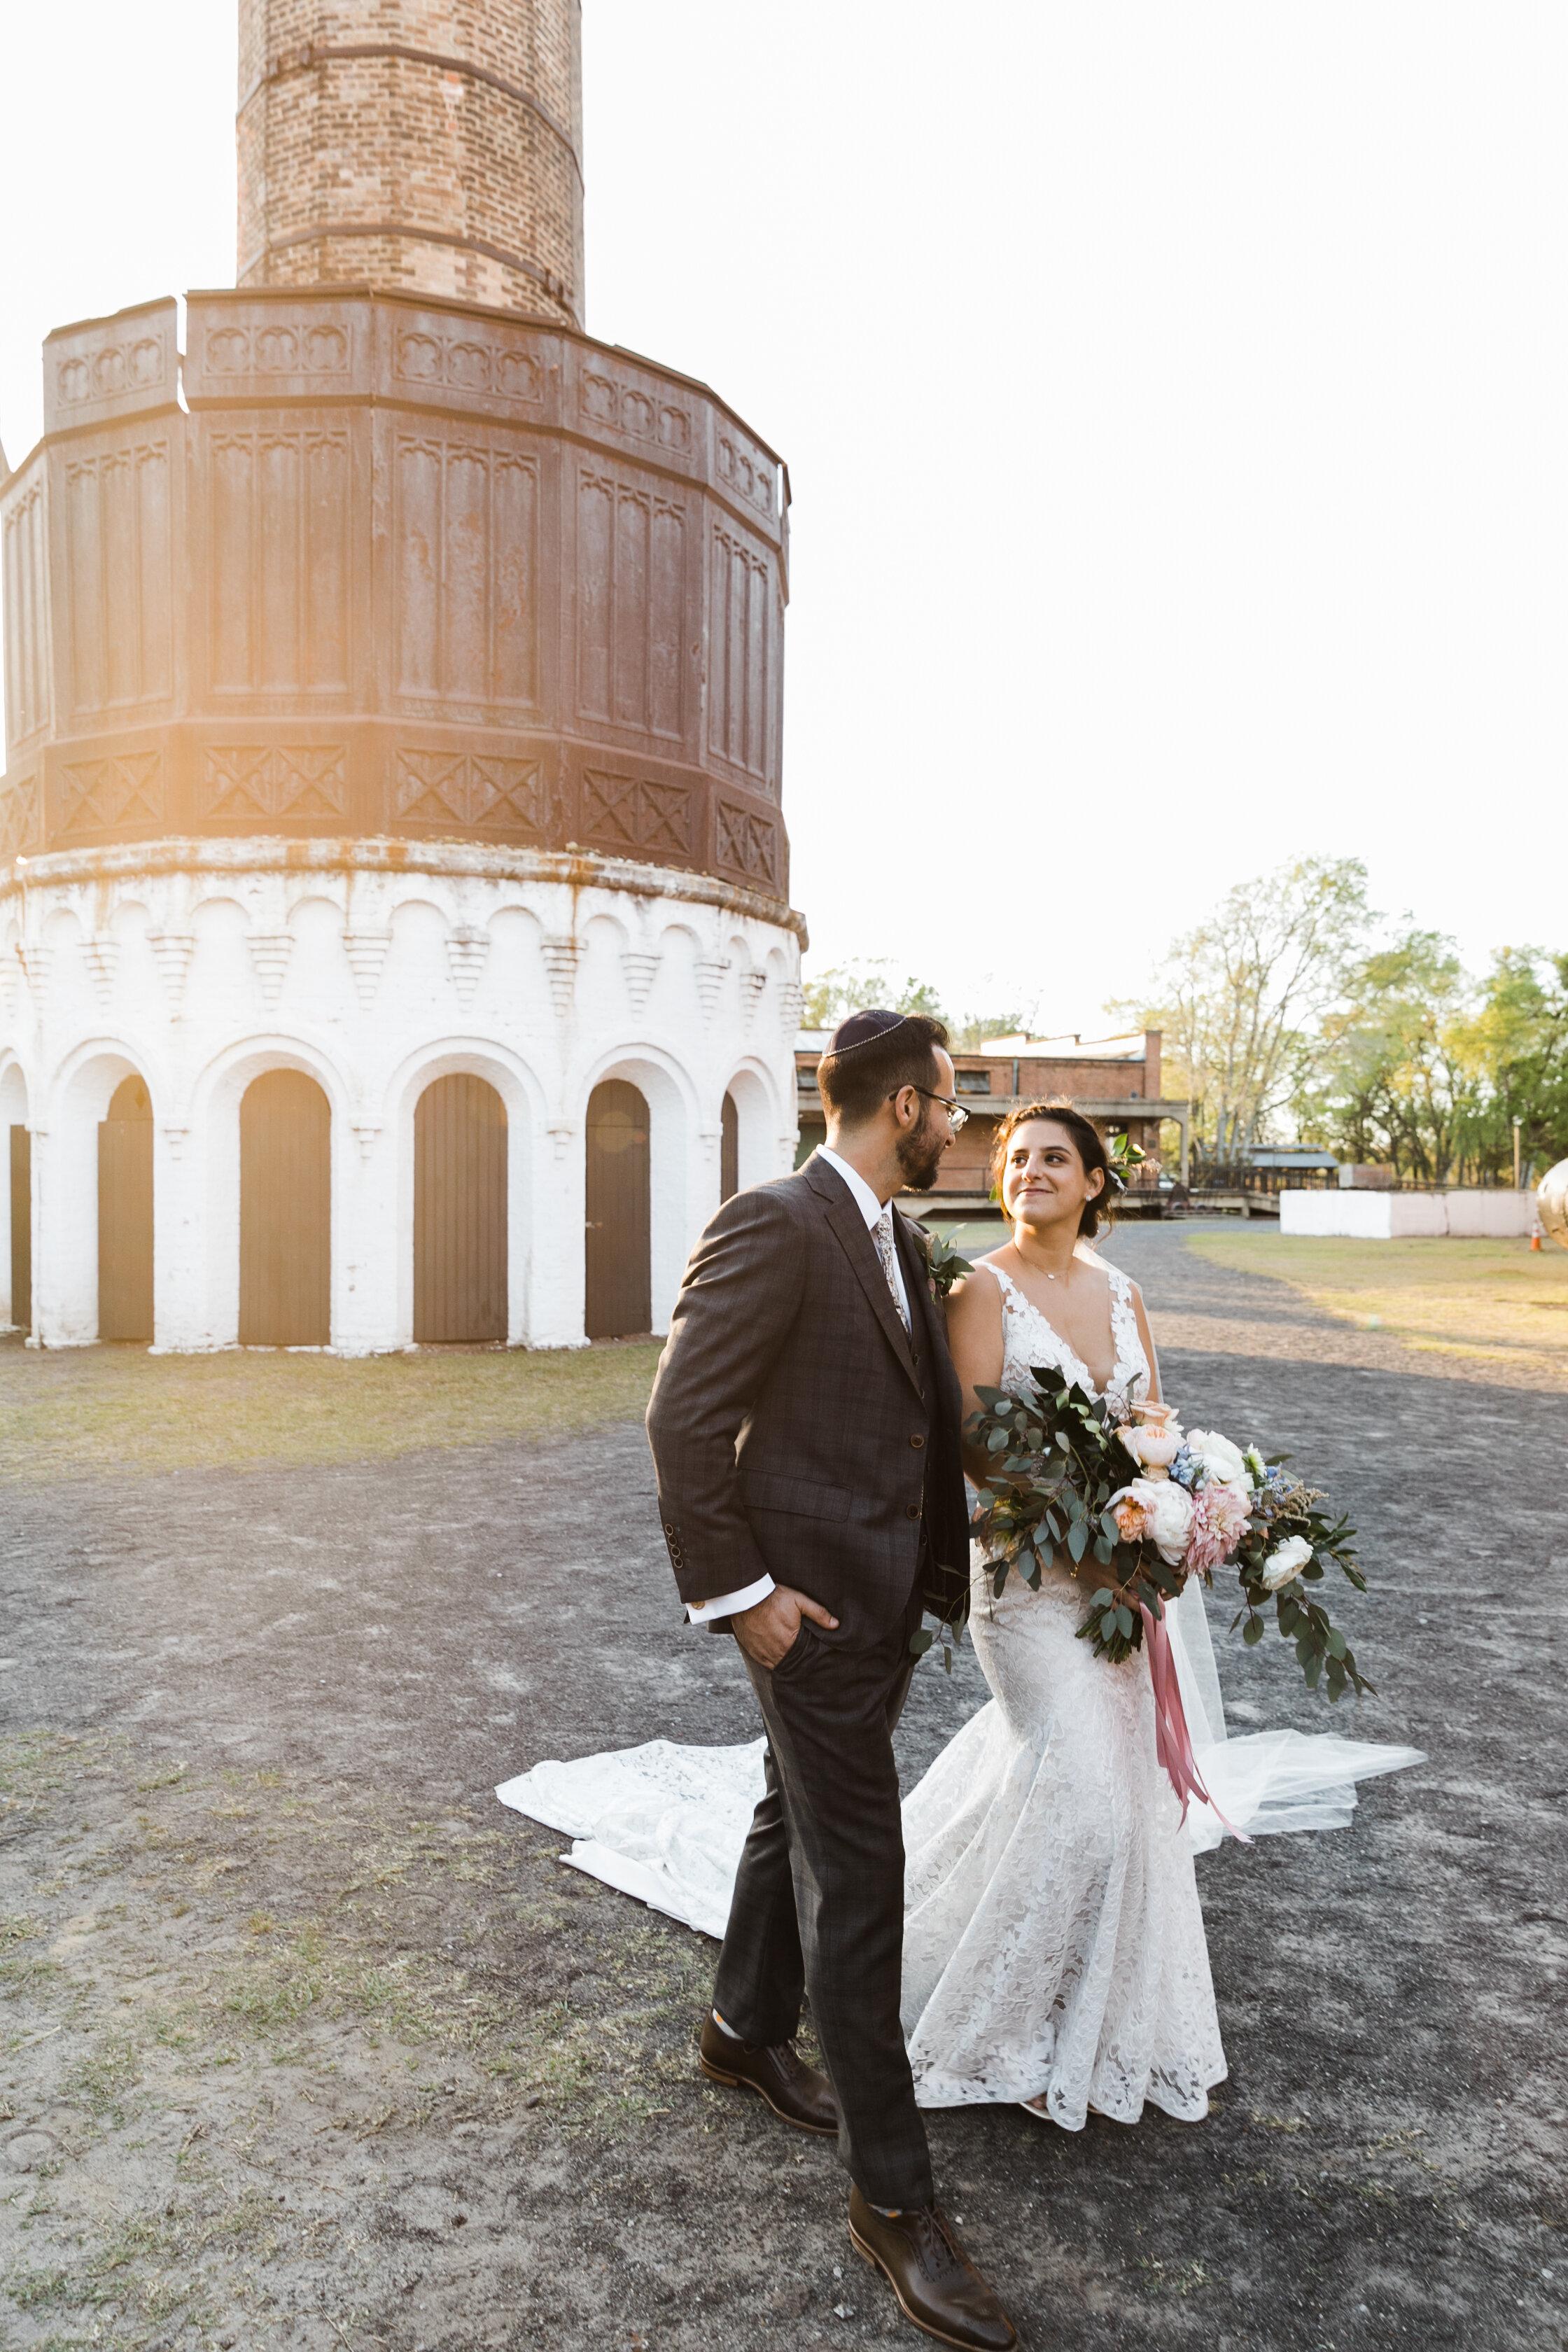 ivory-and-beau-blog-weddings-ivory-and-beau-couple-dominique-and-andres-savannah-florist-wedding-planning-savannah-bridal-boutique-wedding-flowers-KIP_WEBERWEDDING_RAILROADMUSEUM-1281.JPG